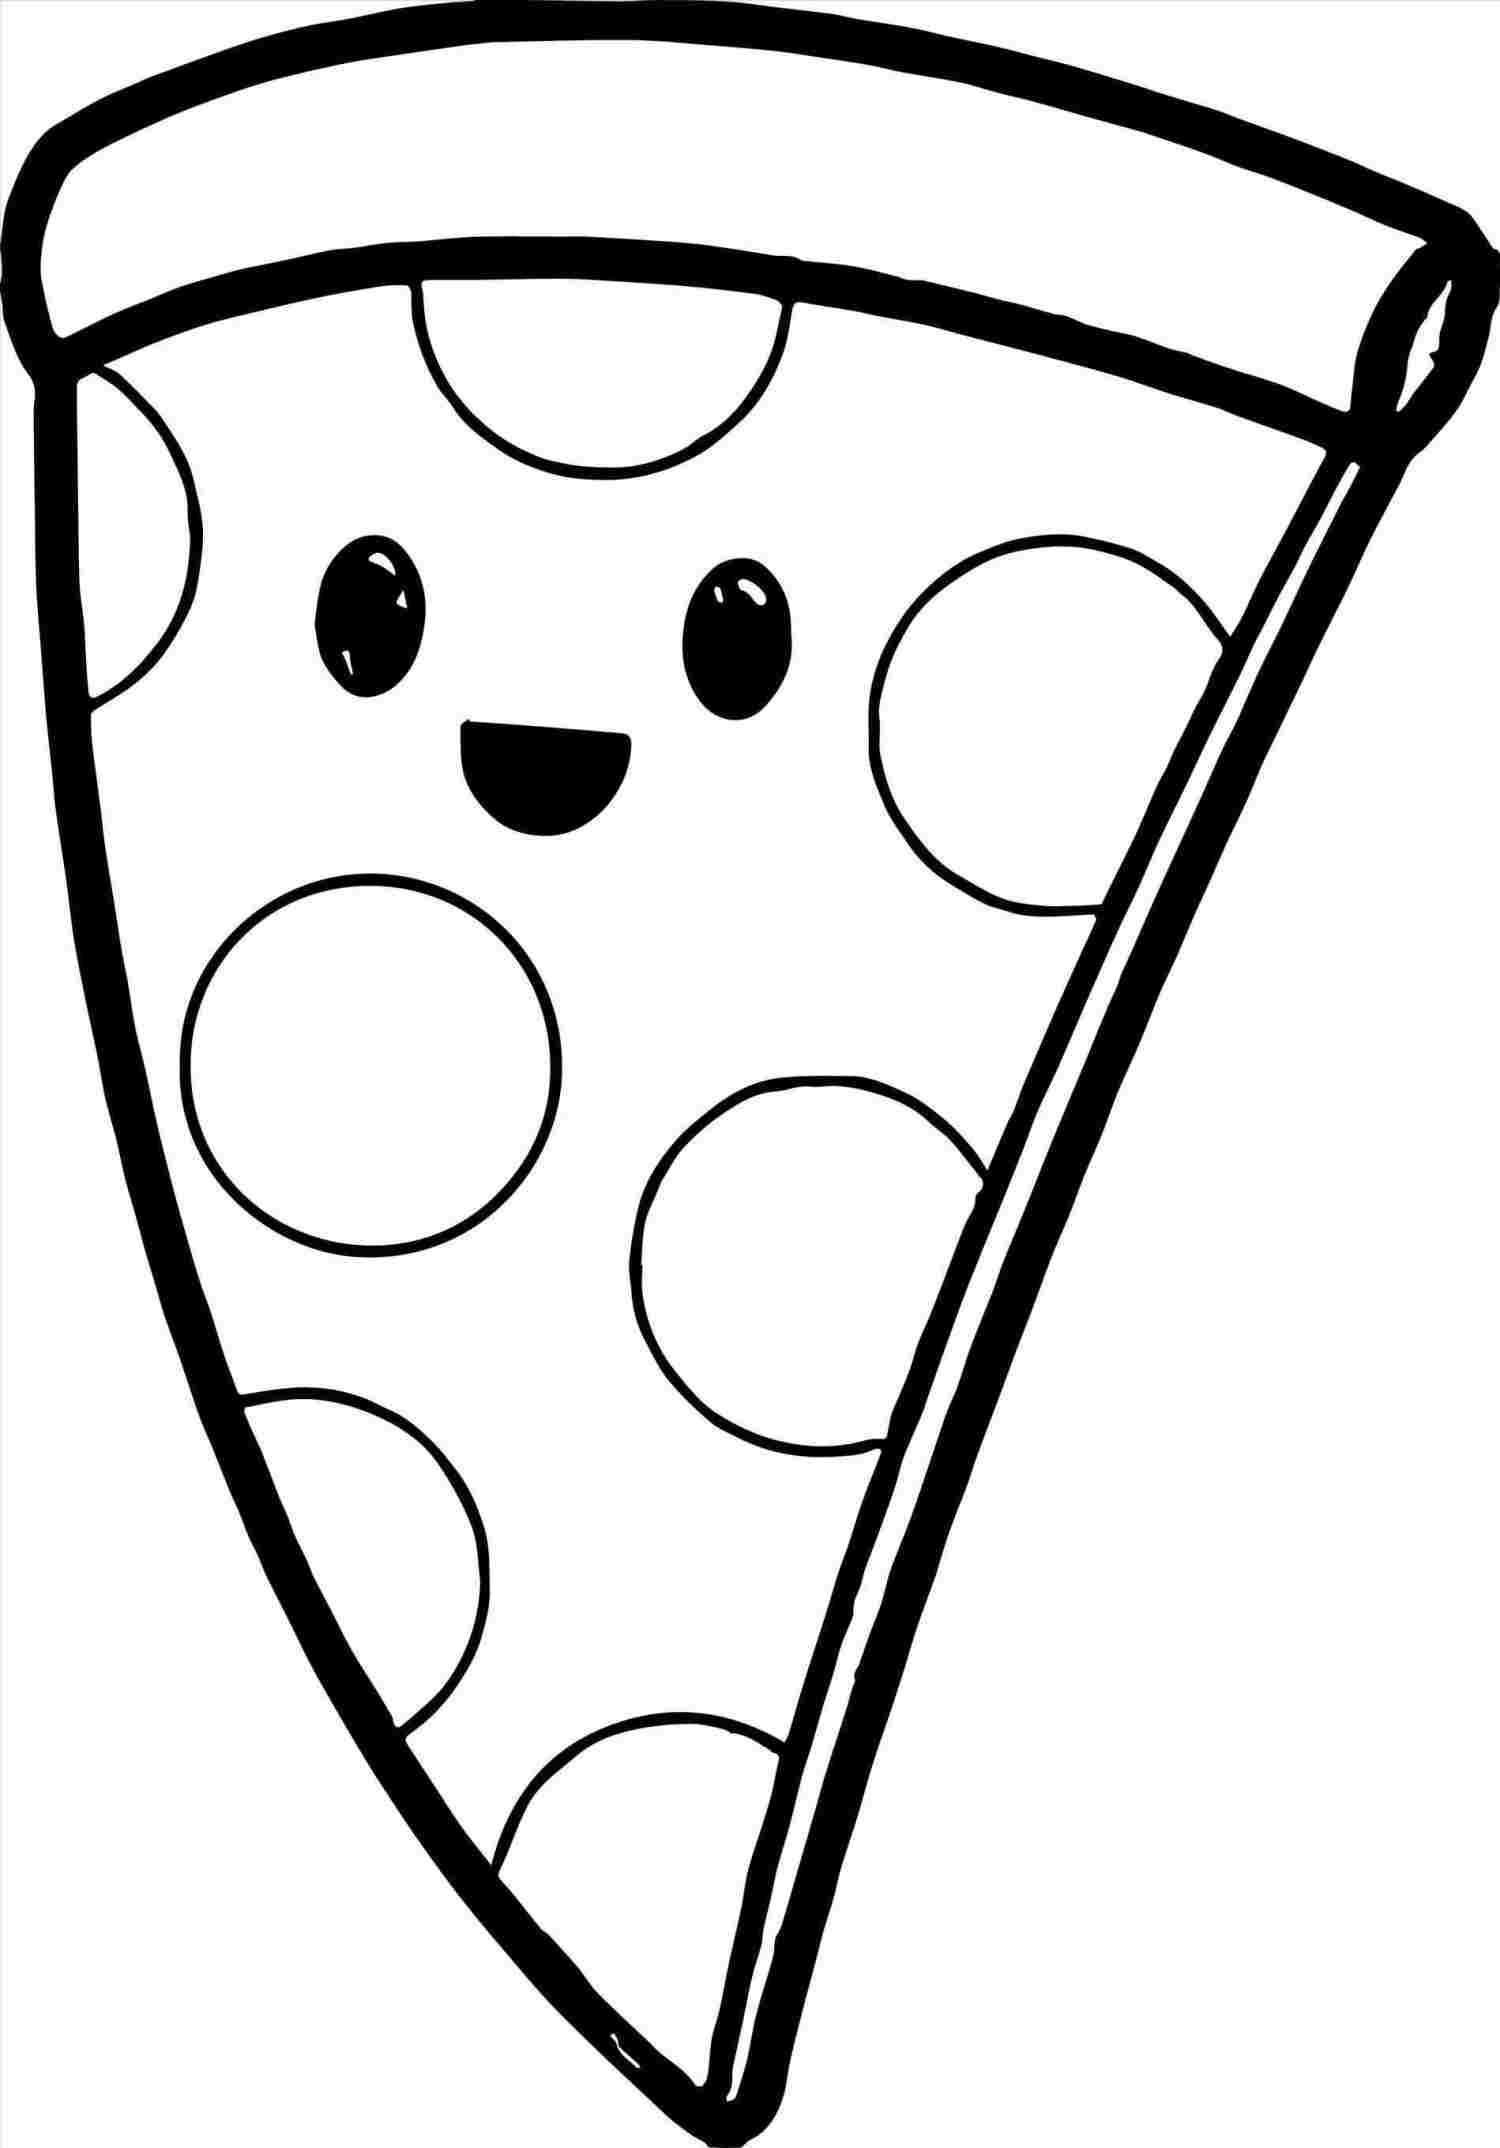 Phow to draw pizza slice clipart photoshop